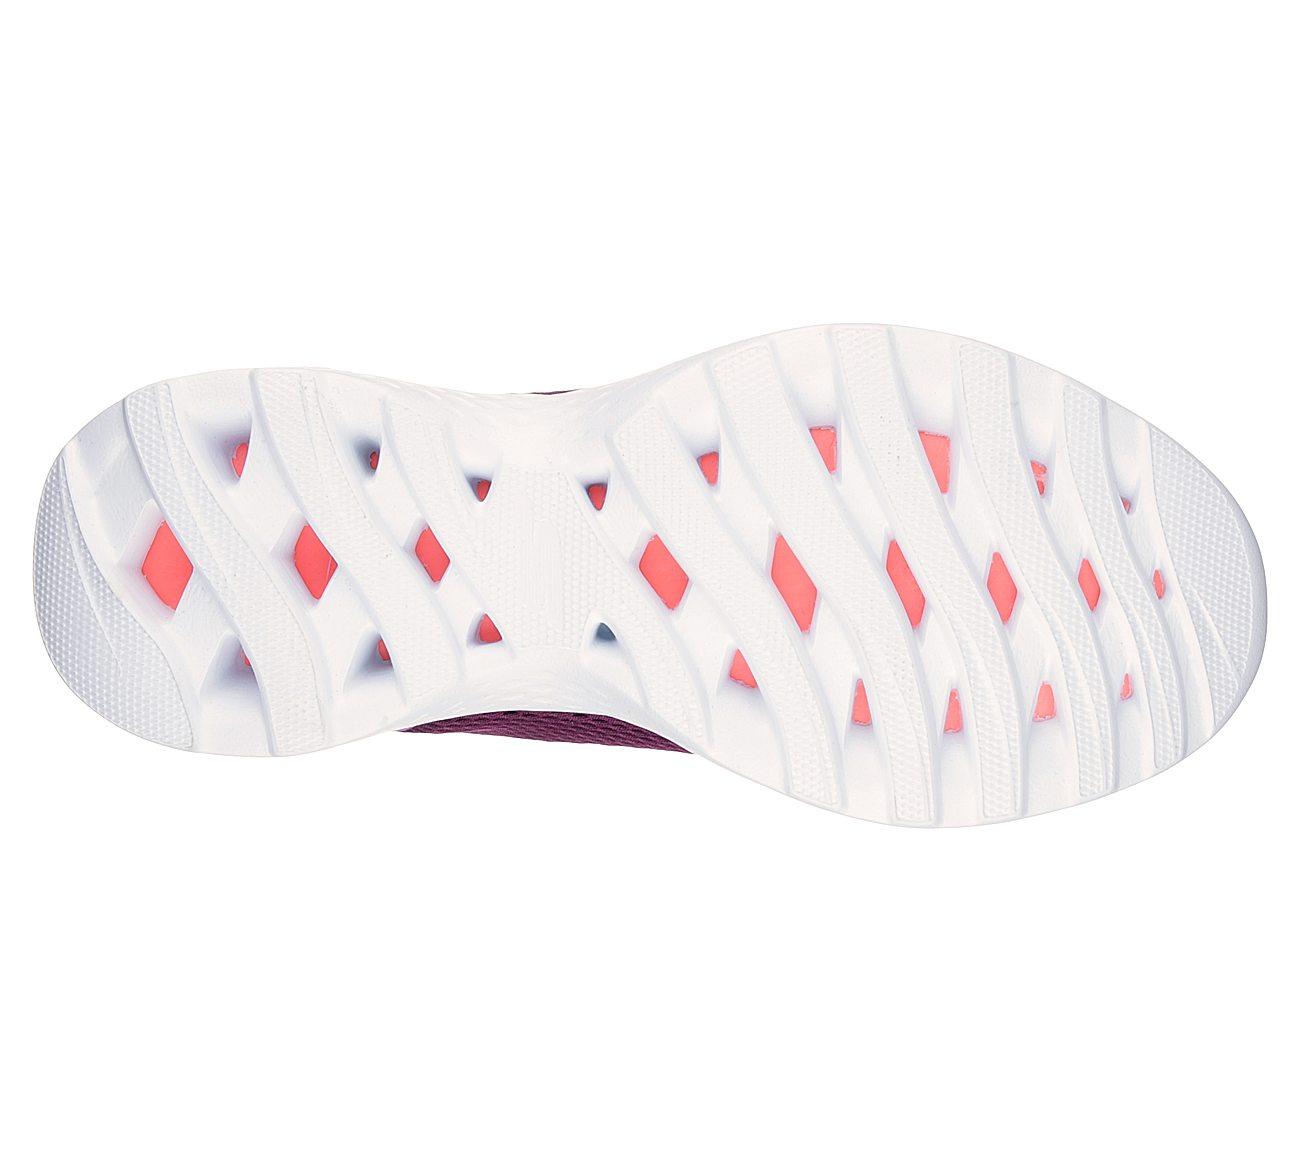 peor Regreso Pesimista  Buy SKECHERS Skechers GOtrain - Hype Skechers Performance Shoes